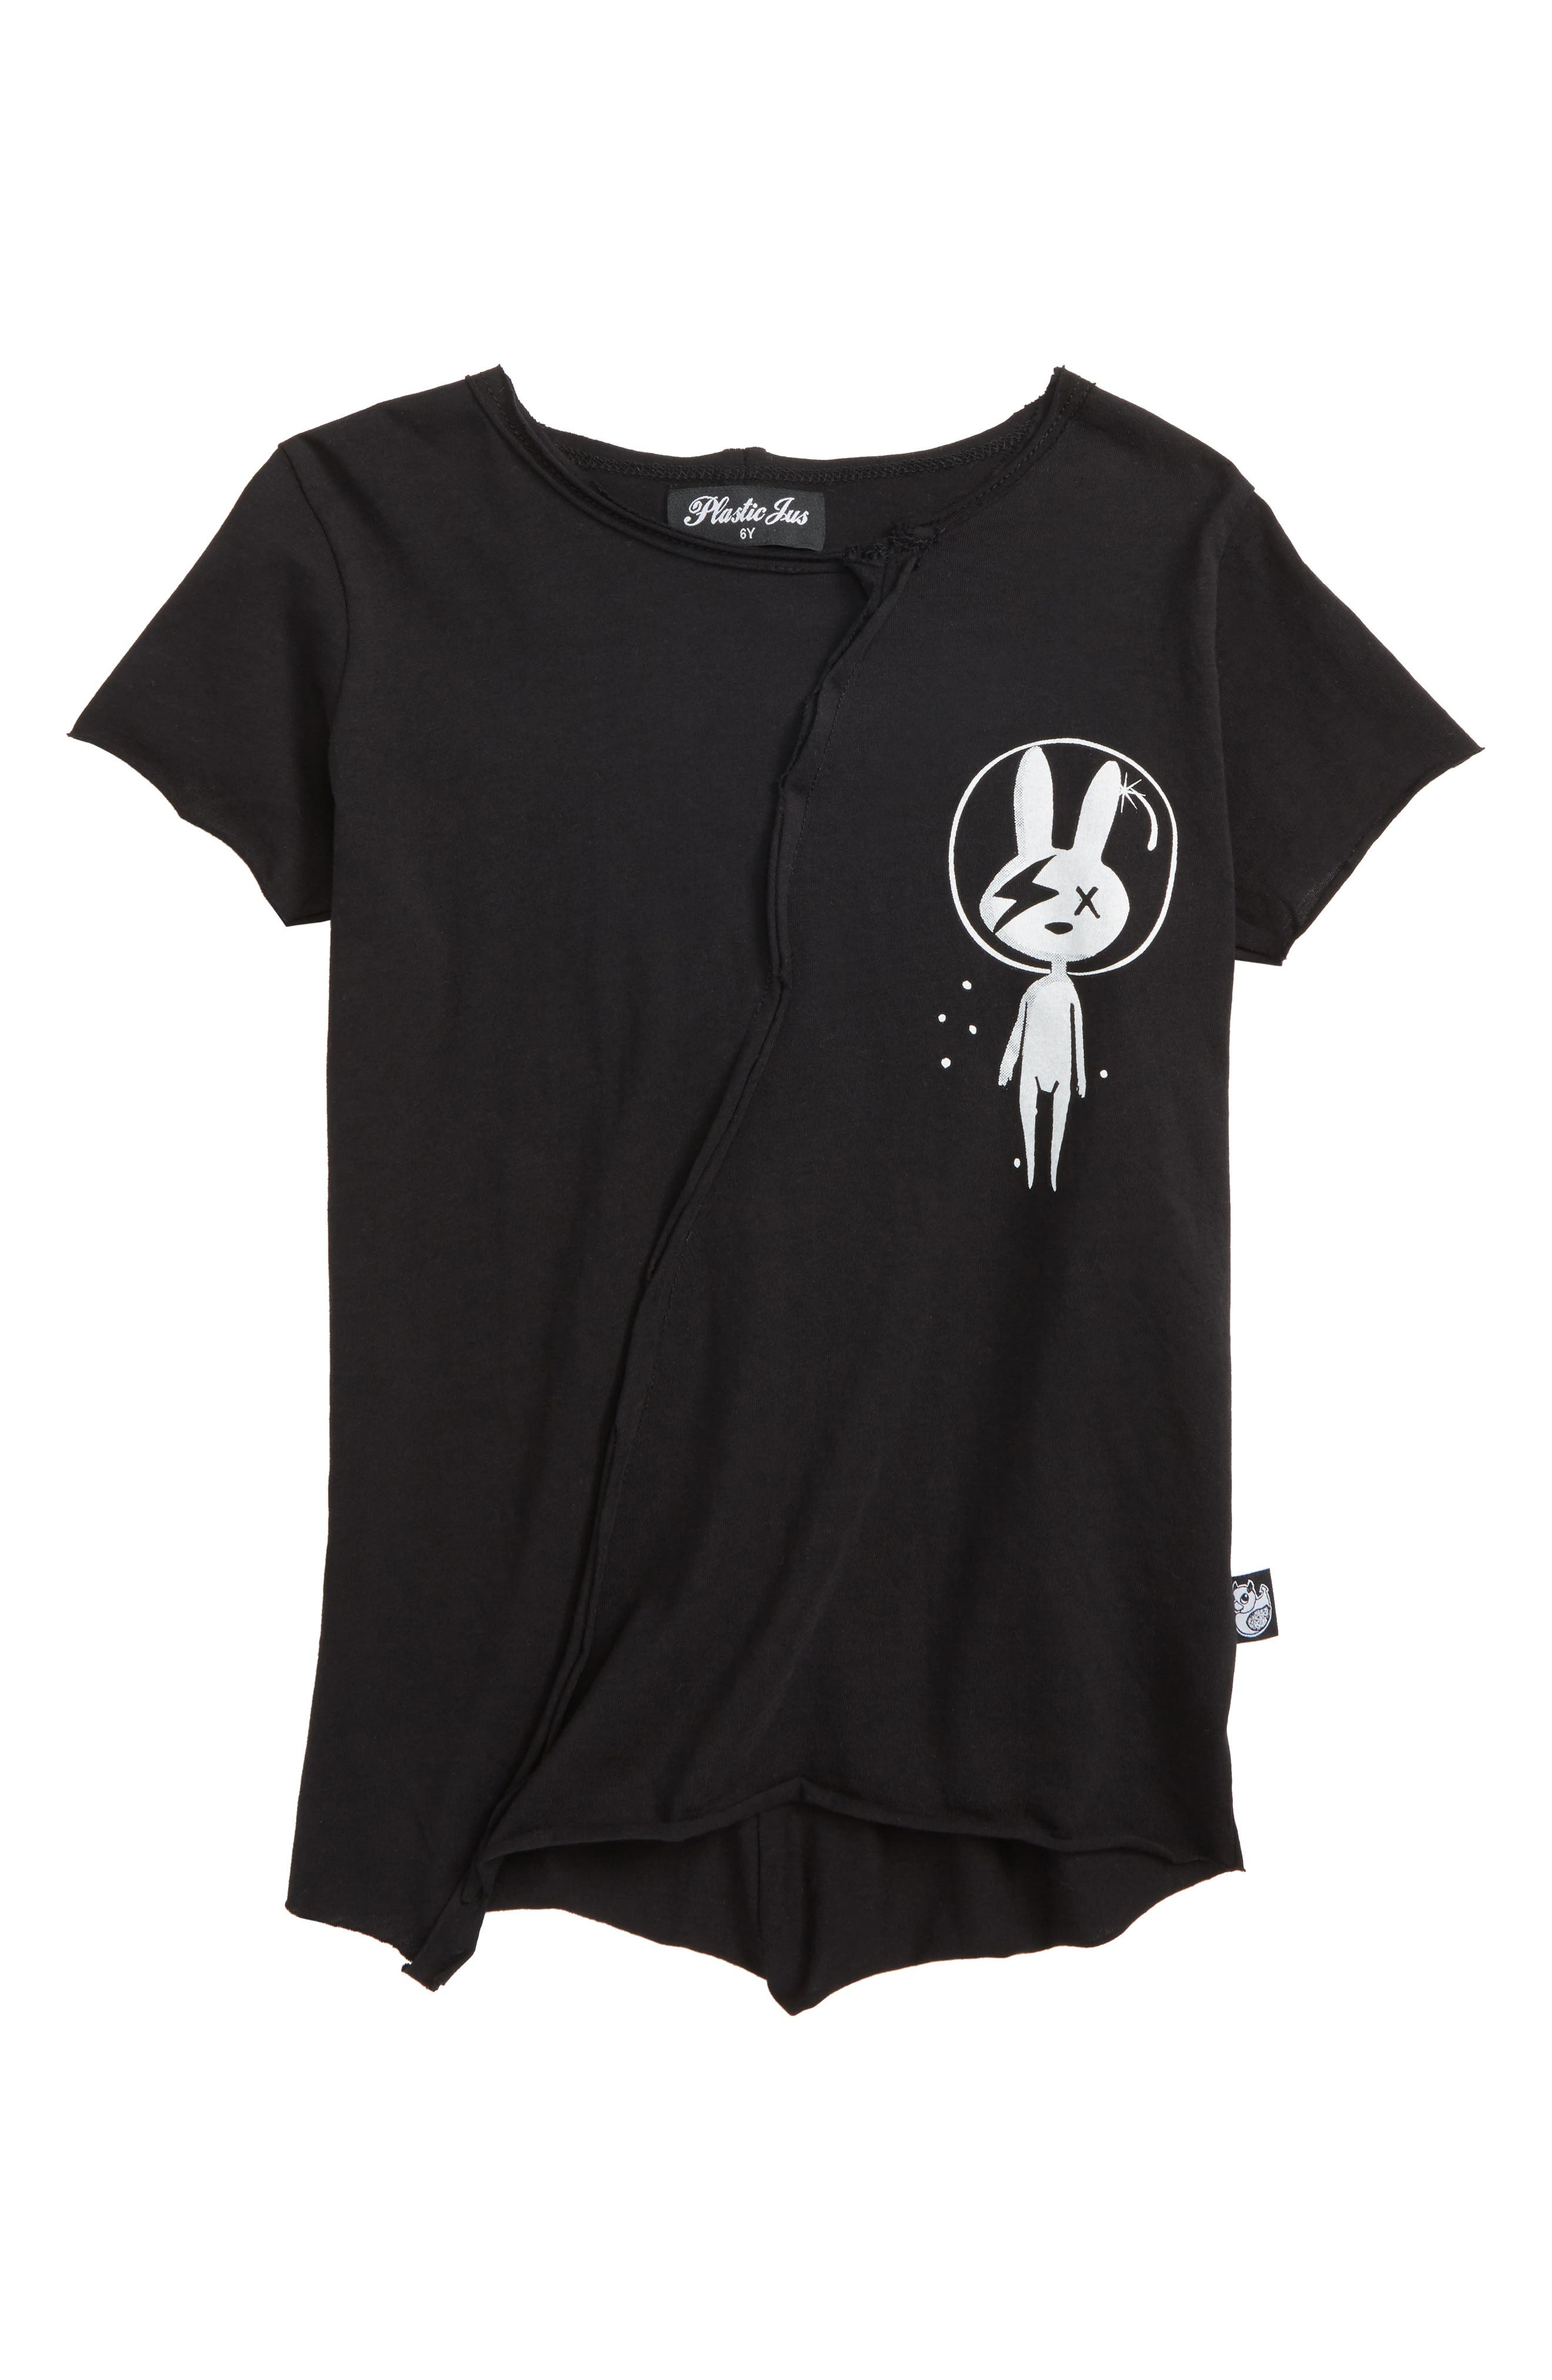 Plastic Jus Astro Bunny Rock Graphic T-Shirt (Baby Boys, Toddler Boys, Little Boys & Big Boys)